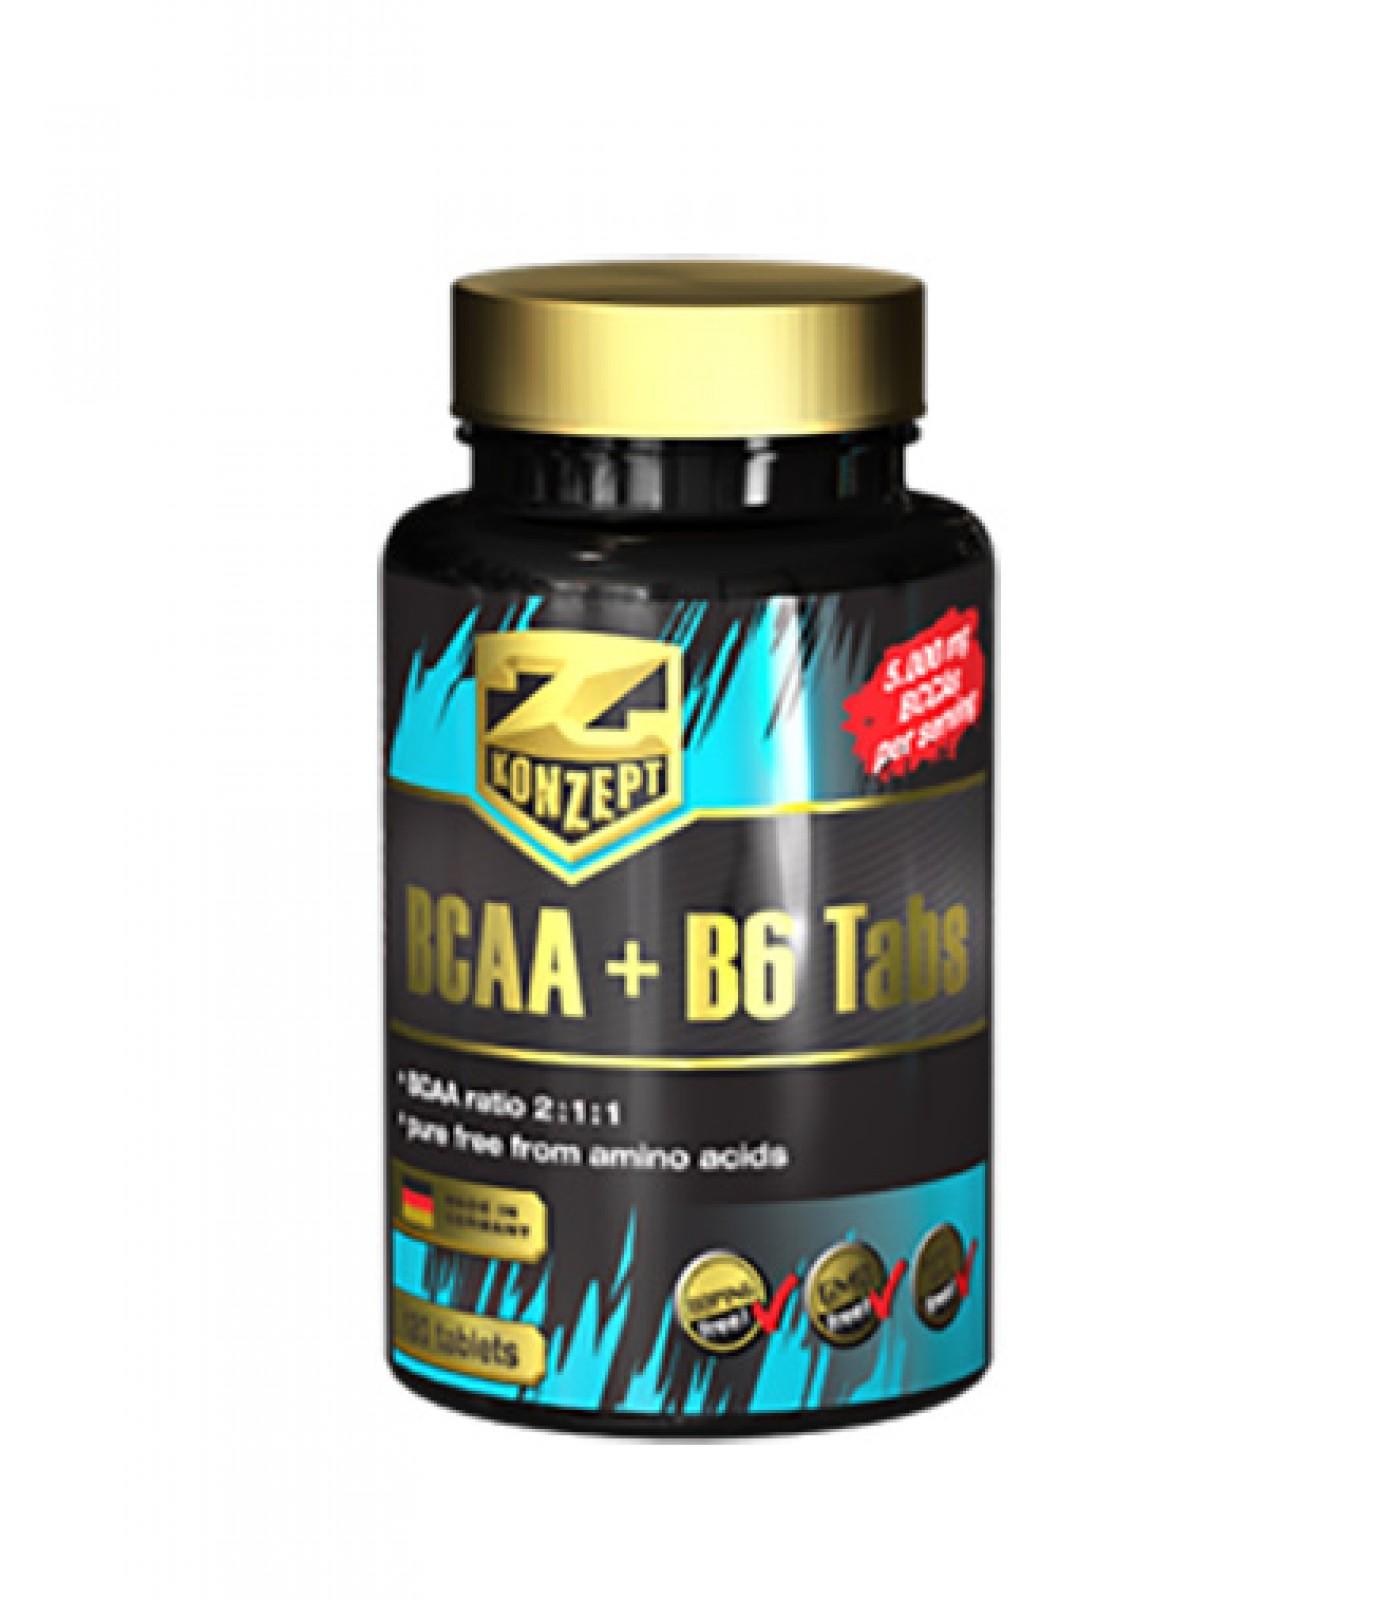 Z Konzept - BCAA + B6 / 120 tabs.